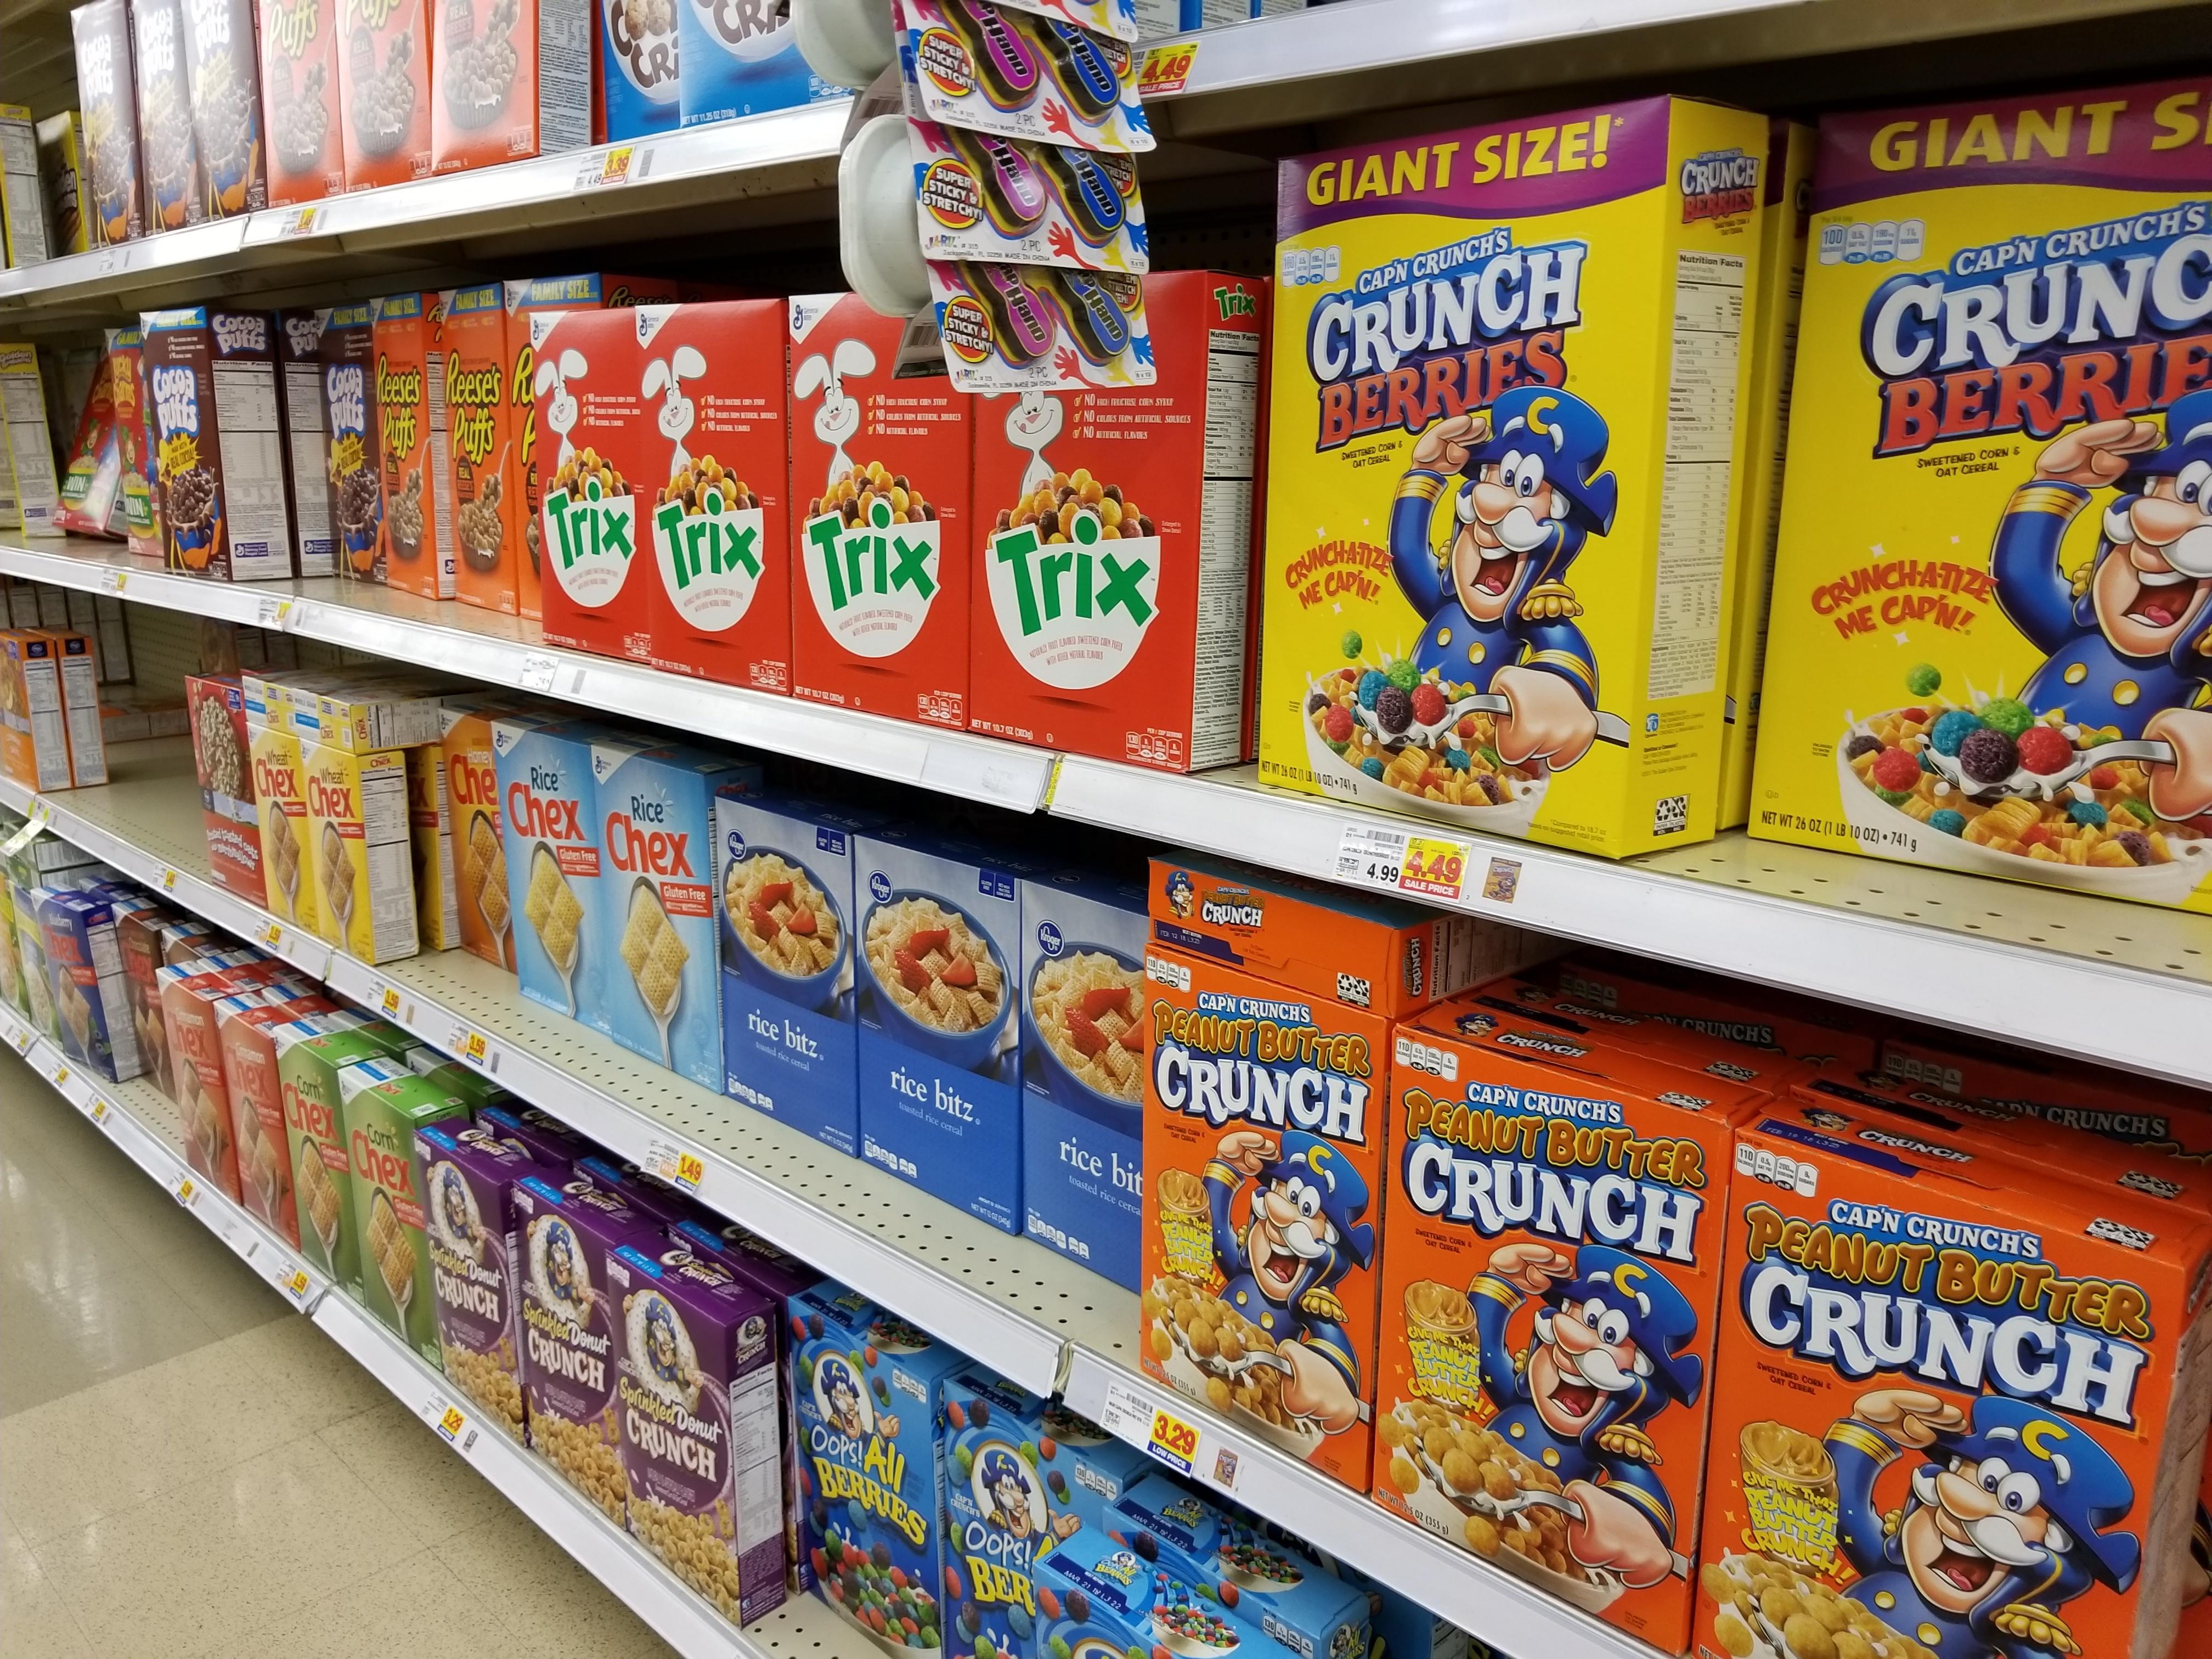 Cereal-Isle-Foods to avoid-9.8.17.jpg